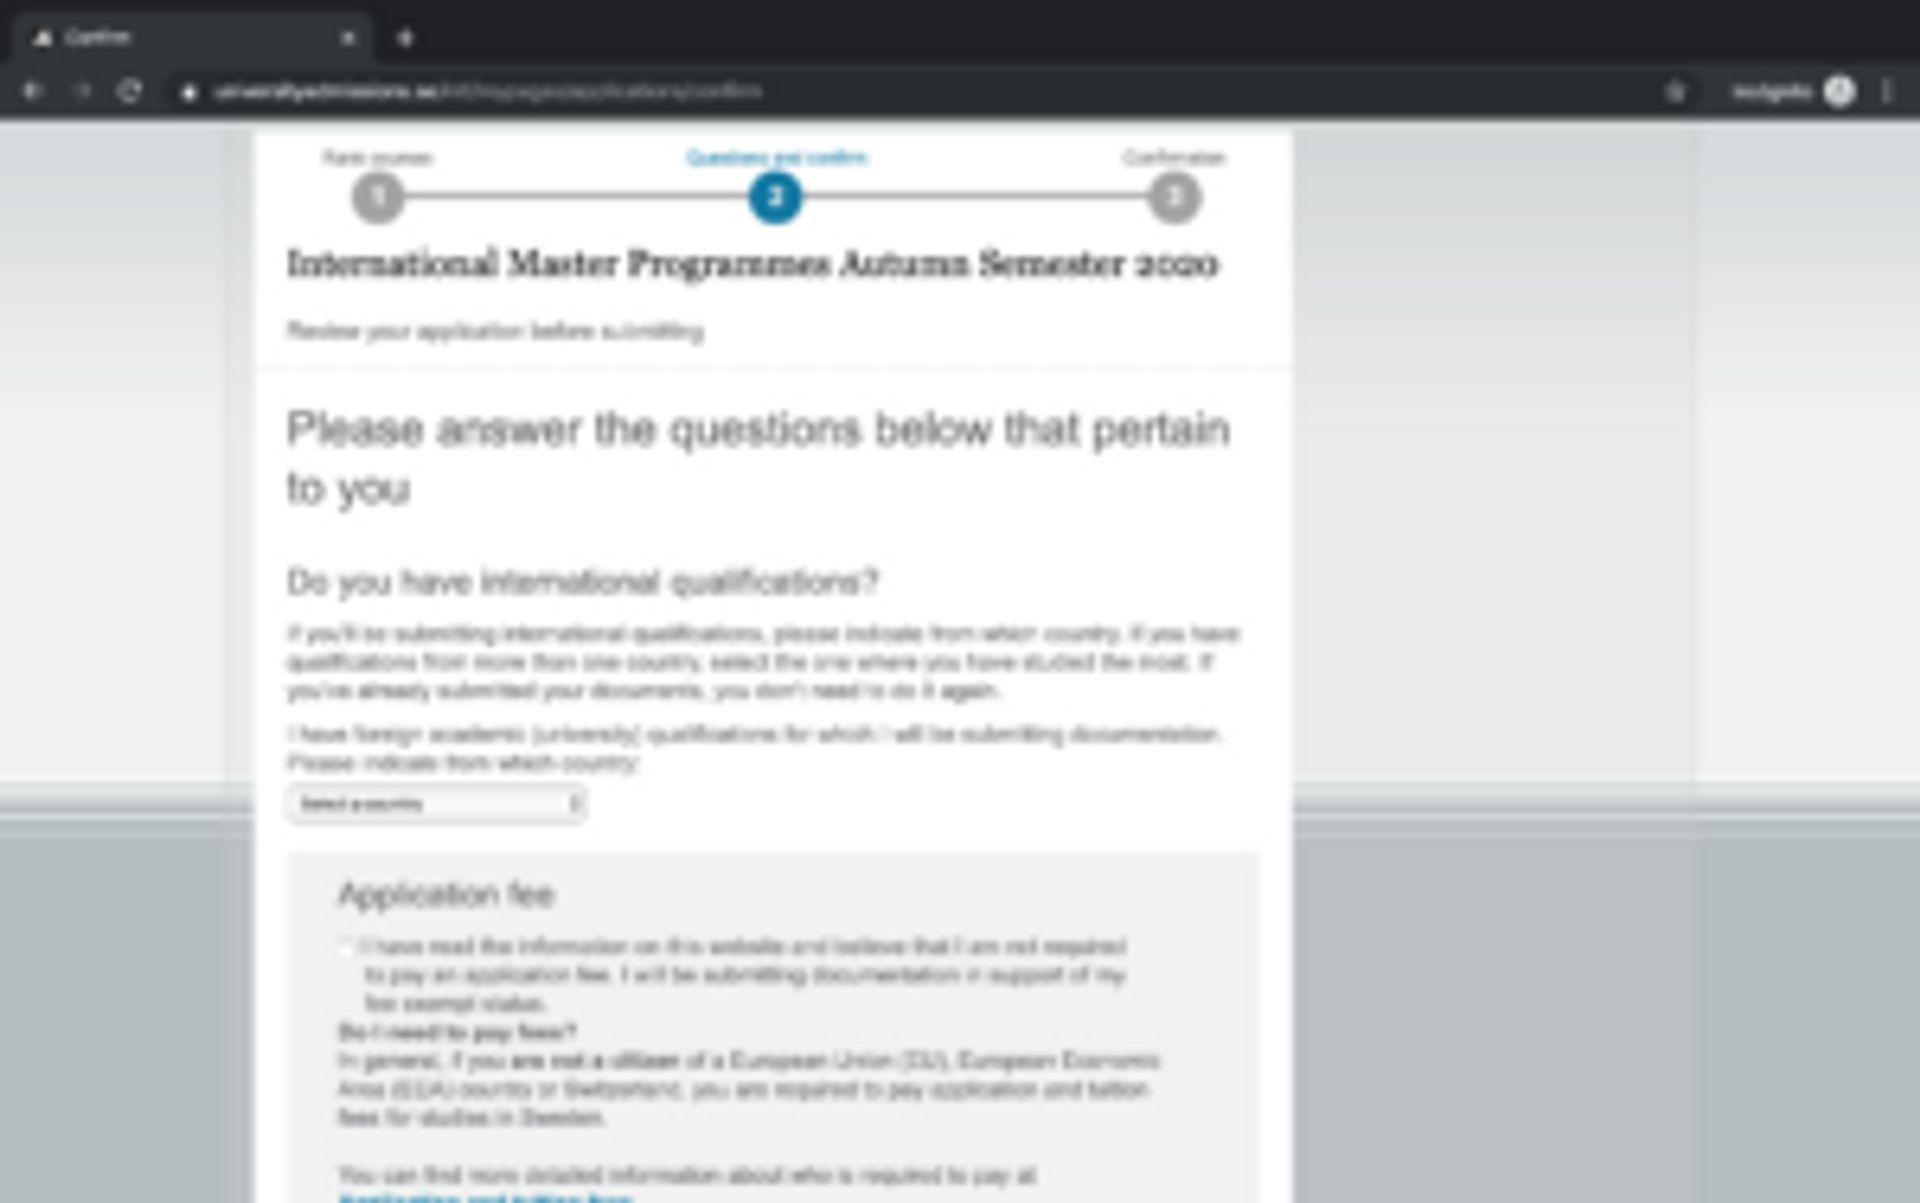 Screenshot of application instructions.